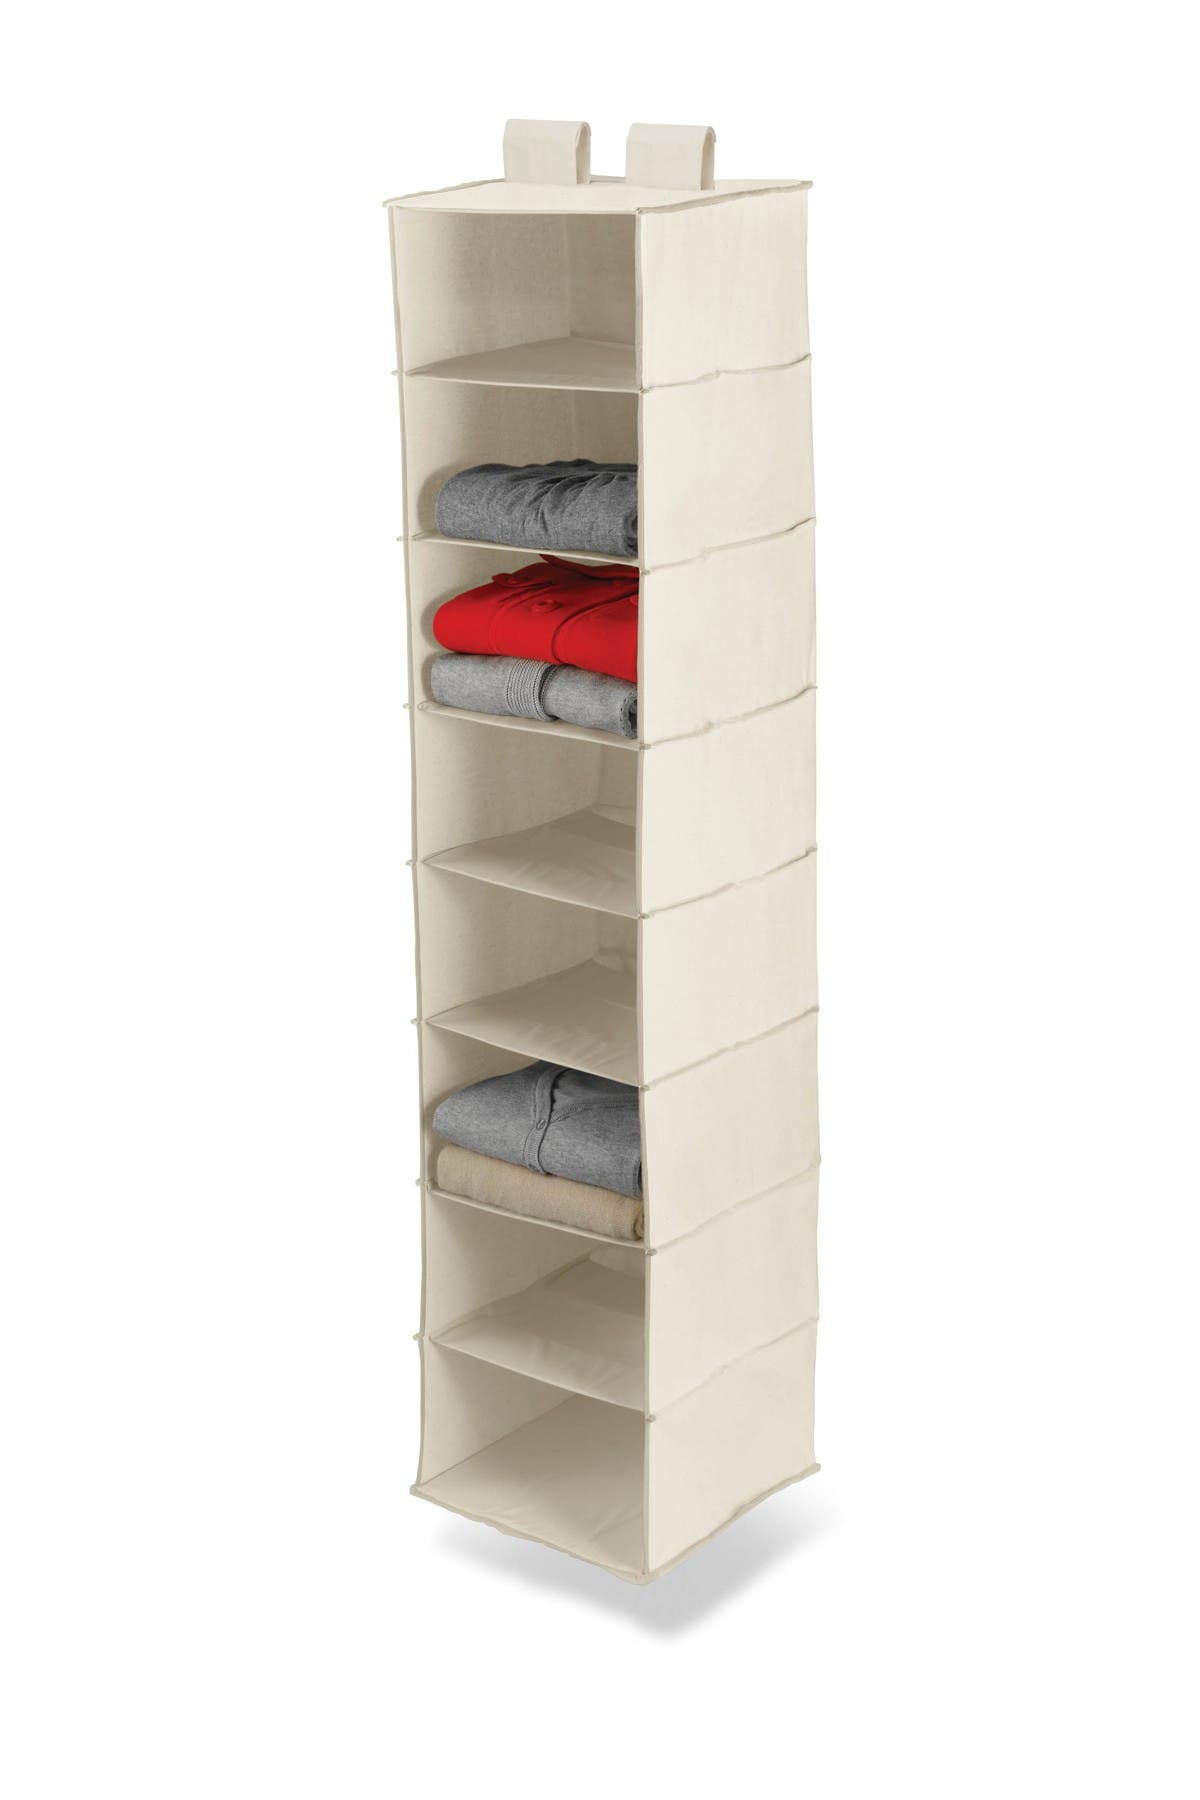 Image of Honey-Can-Do 8 Shelf Hanging Organizer - Natural